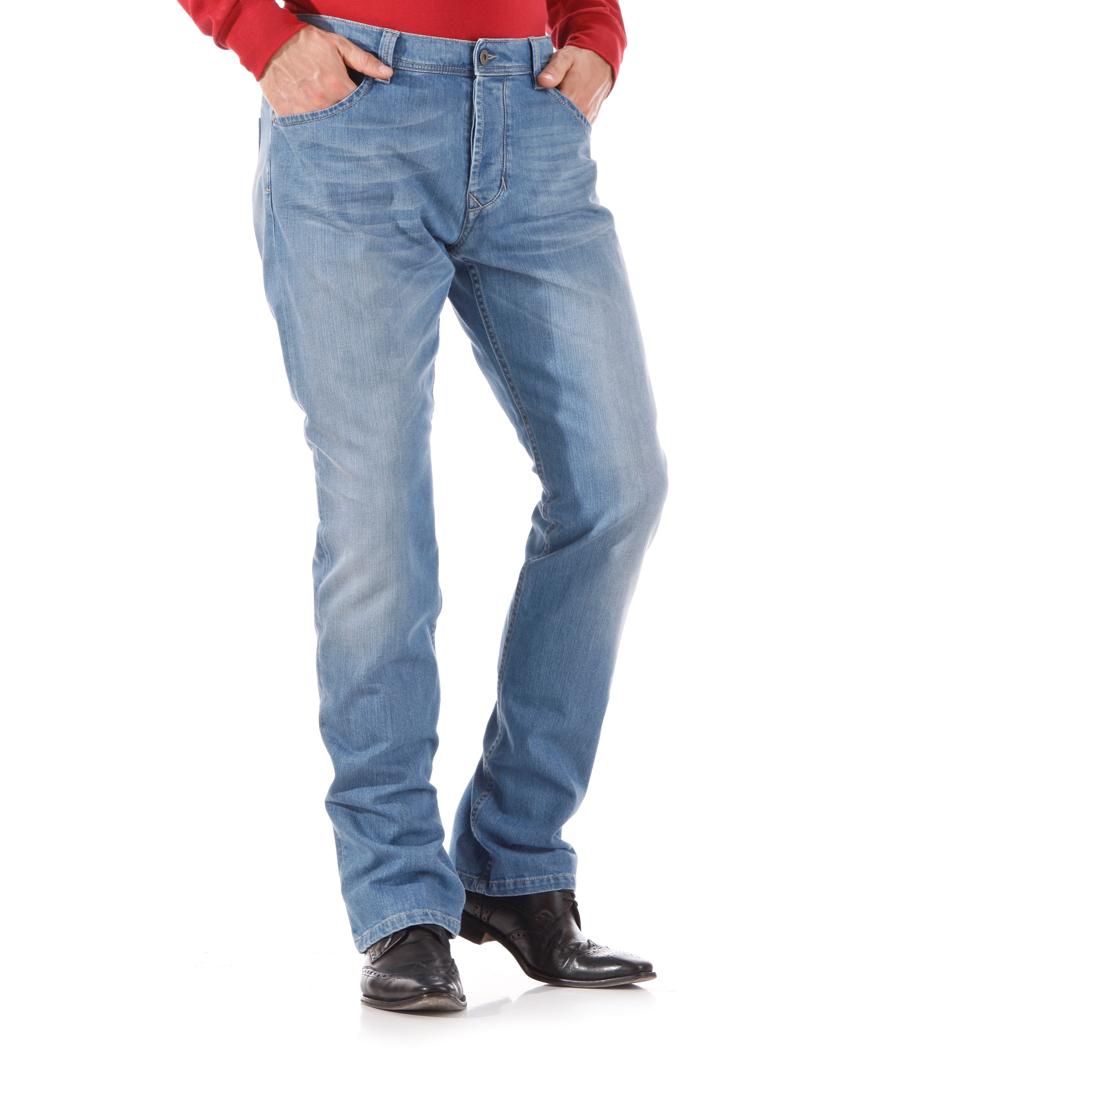 Herren Stretch Jeans Hose